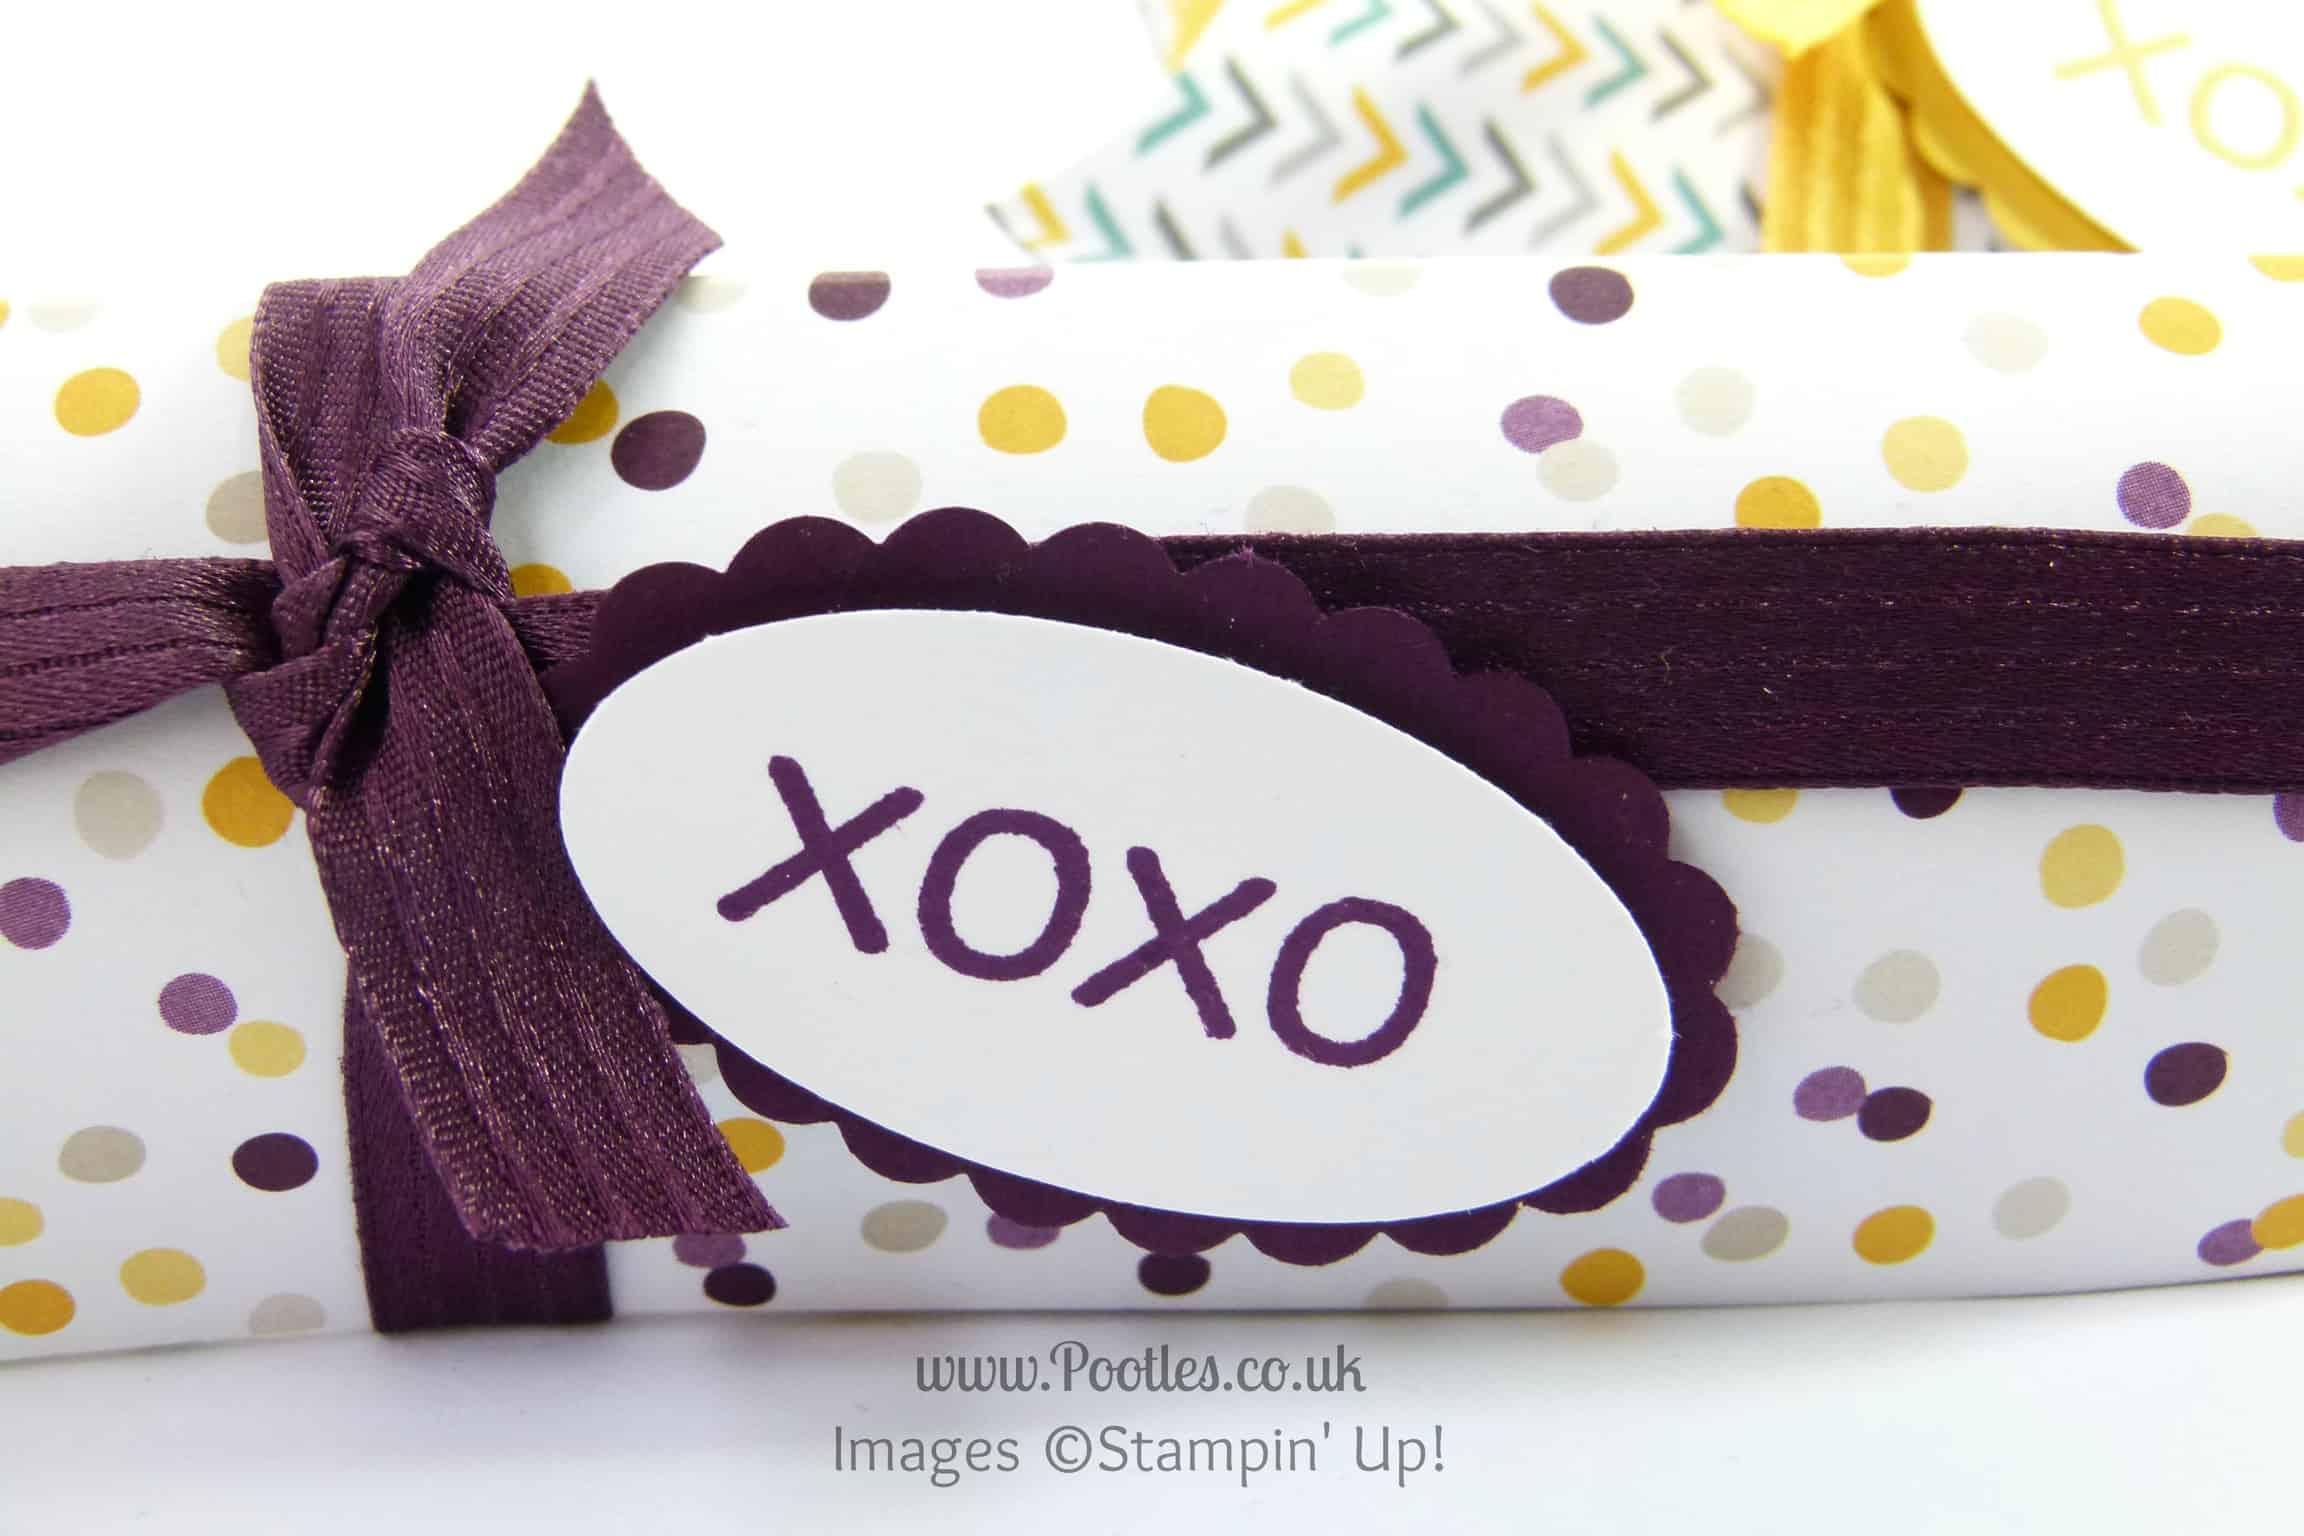 Stampin Up UK Demonstrator Pootles - Pillow Box using DSP Stacks Tutorial Stamped close up